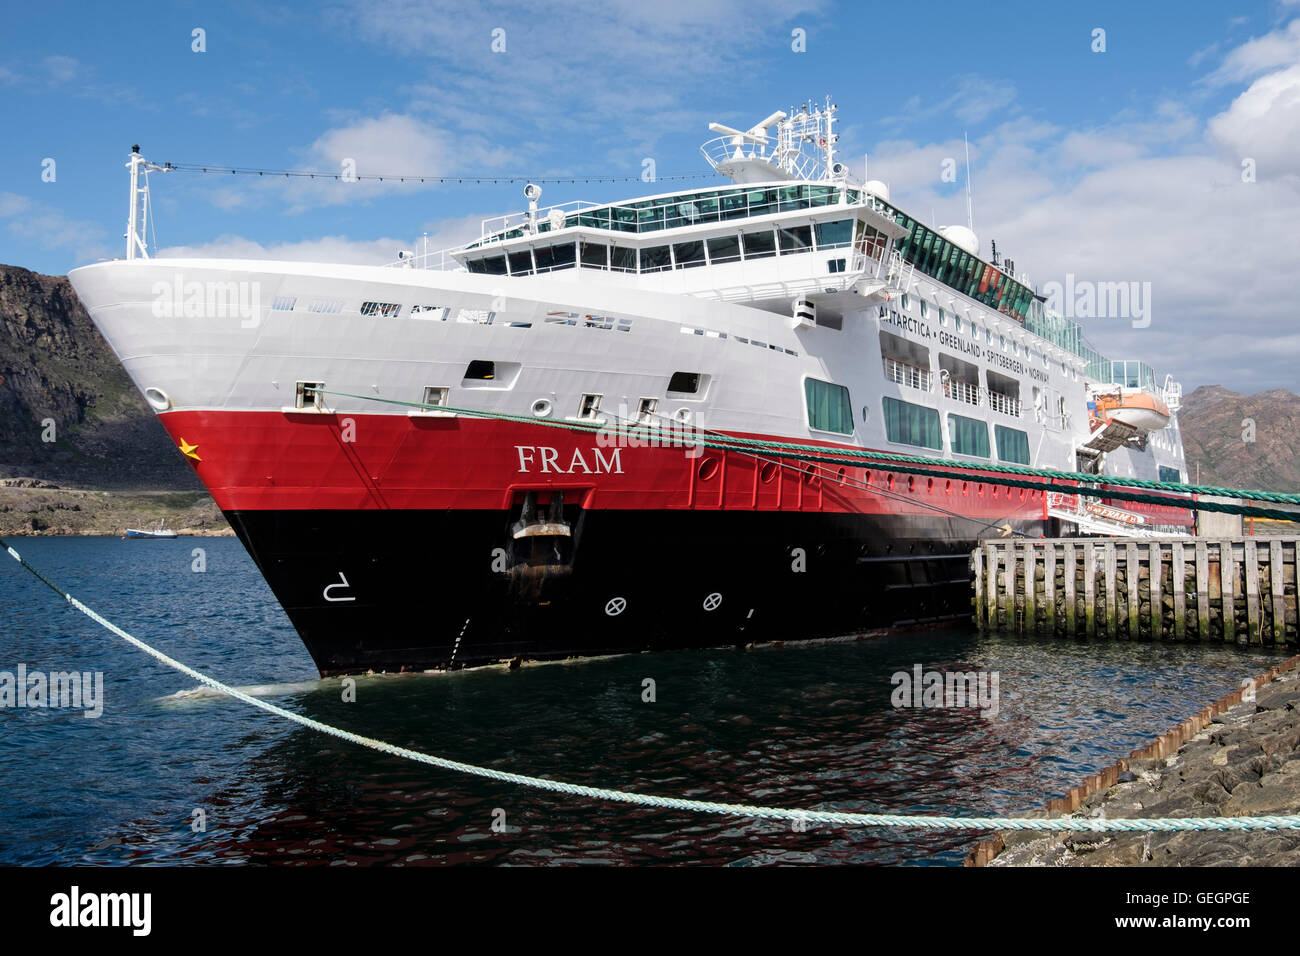 Hurtigruten MS Fram Explorer Cruise Schiff angedockt am Kai im Hafen von Sisimiut (Holsteinsborg), Qeqqata, Westgrönland Stockbild